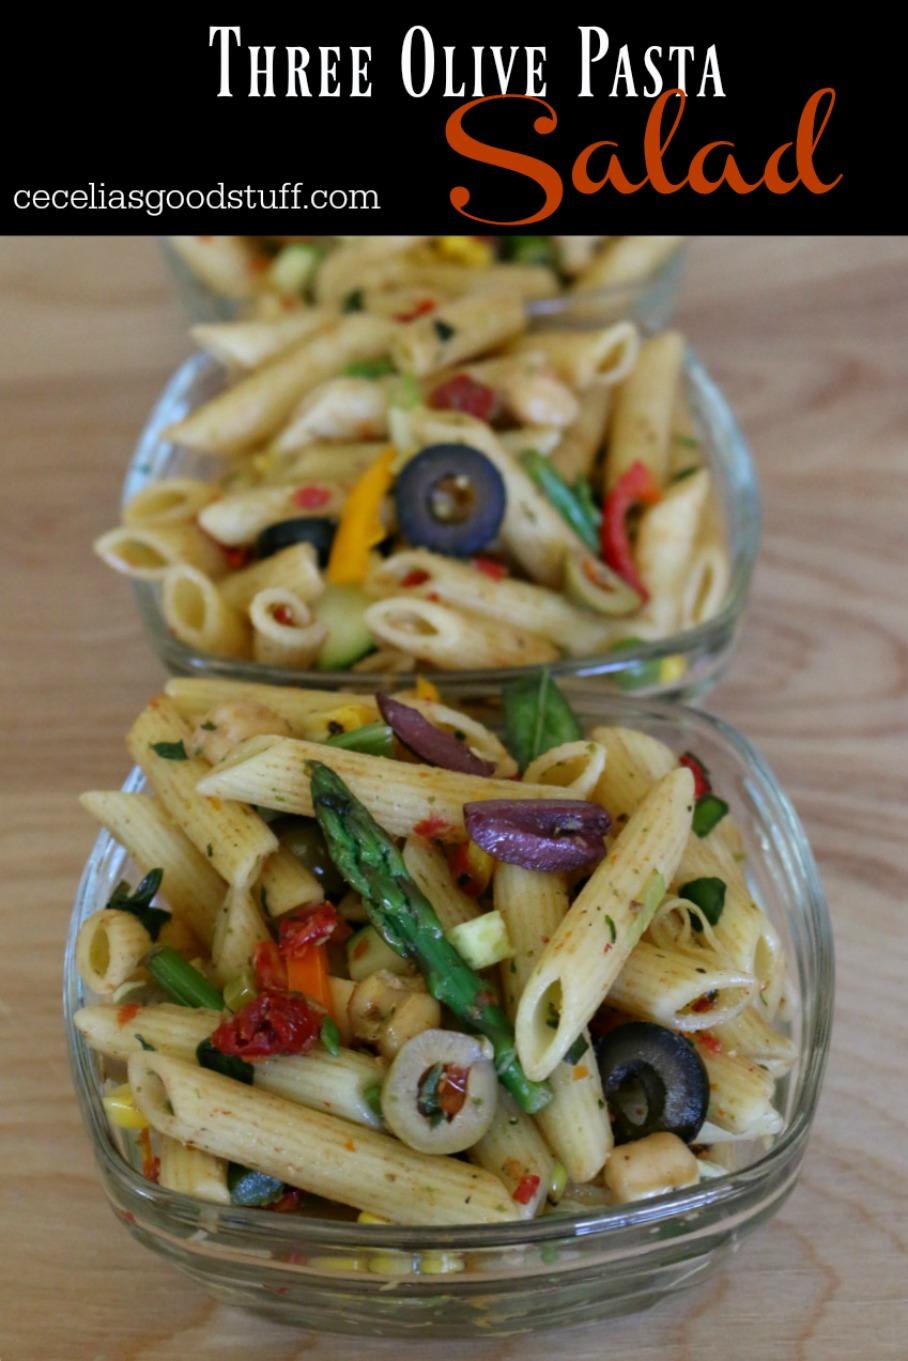 Recipe for Three Olive Pasta Salad